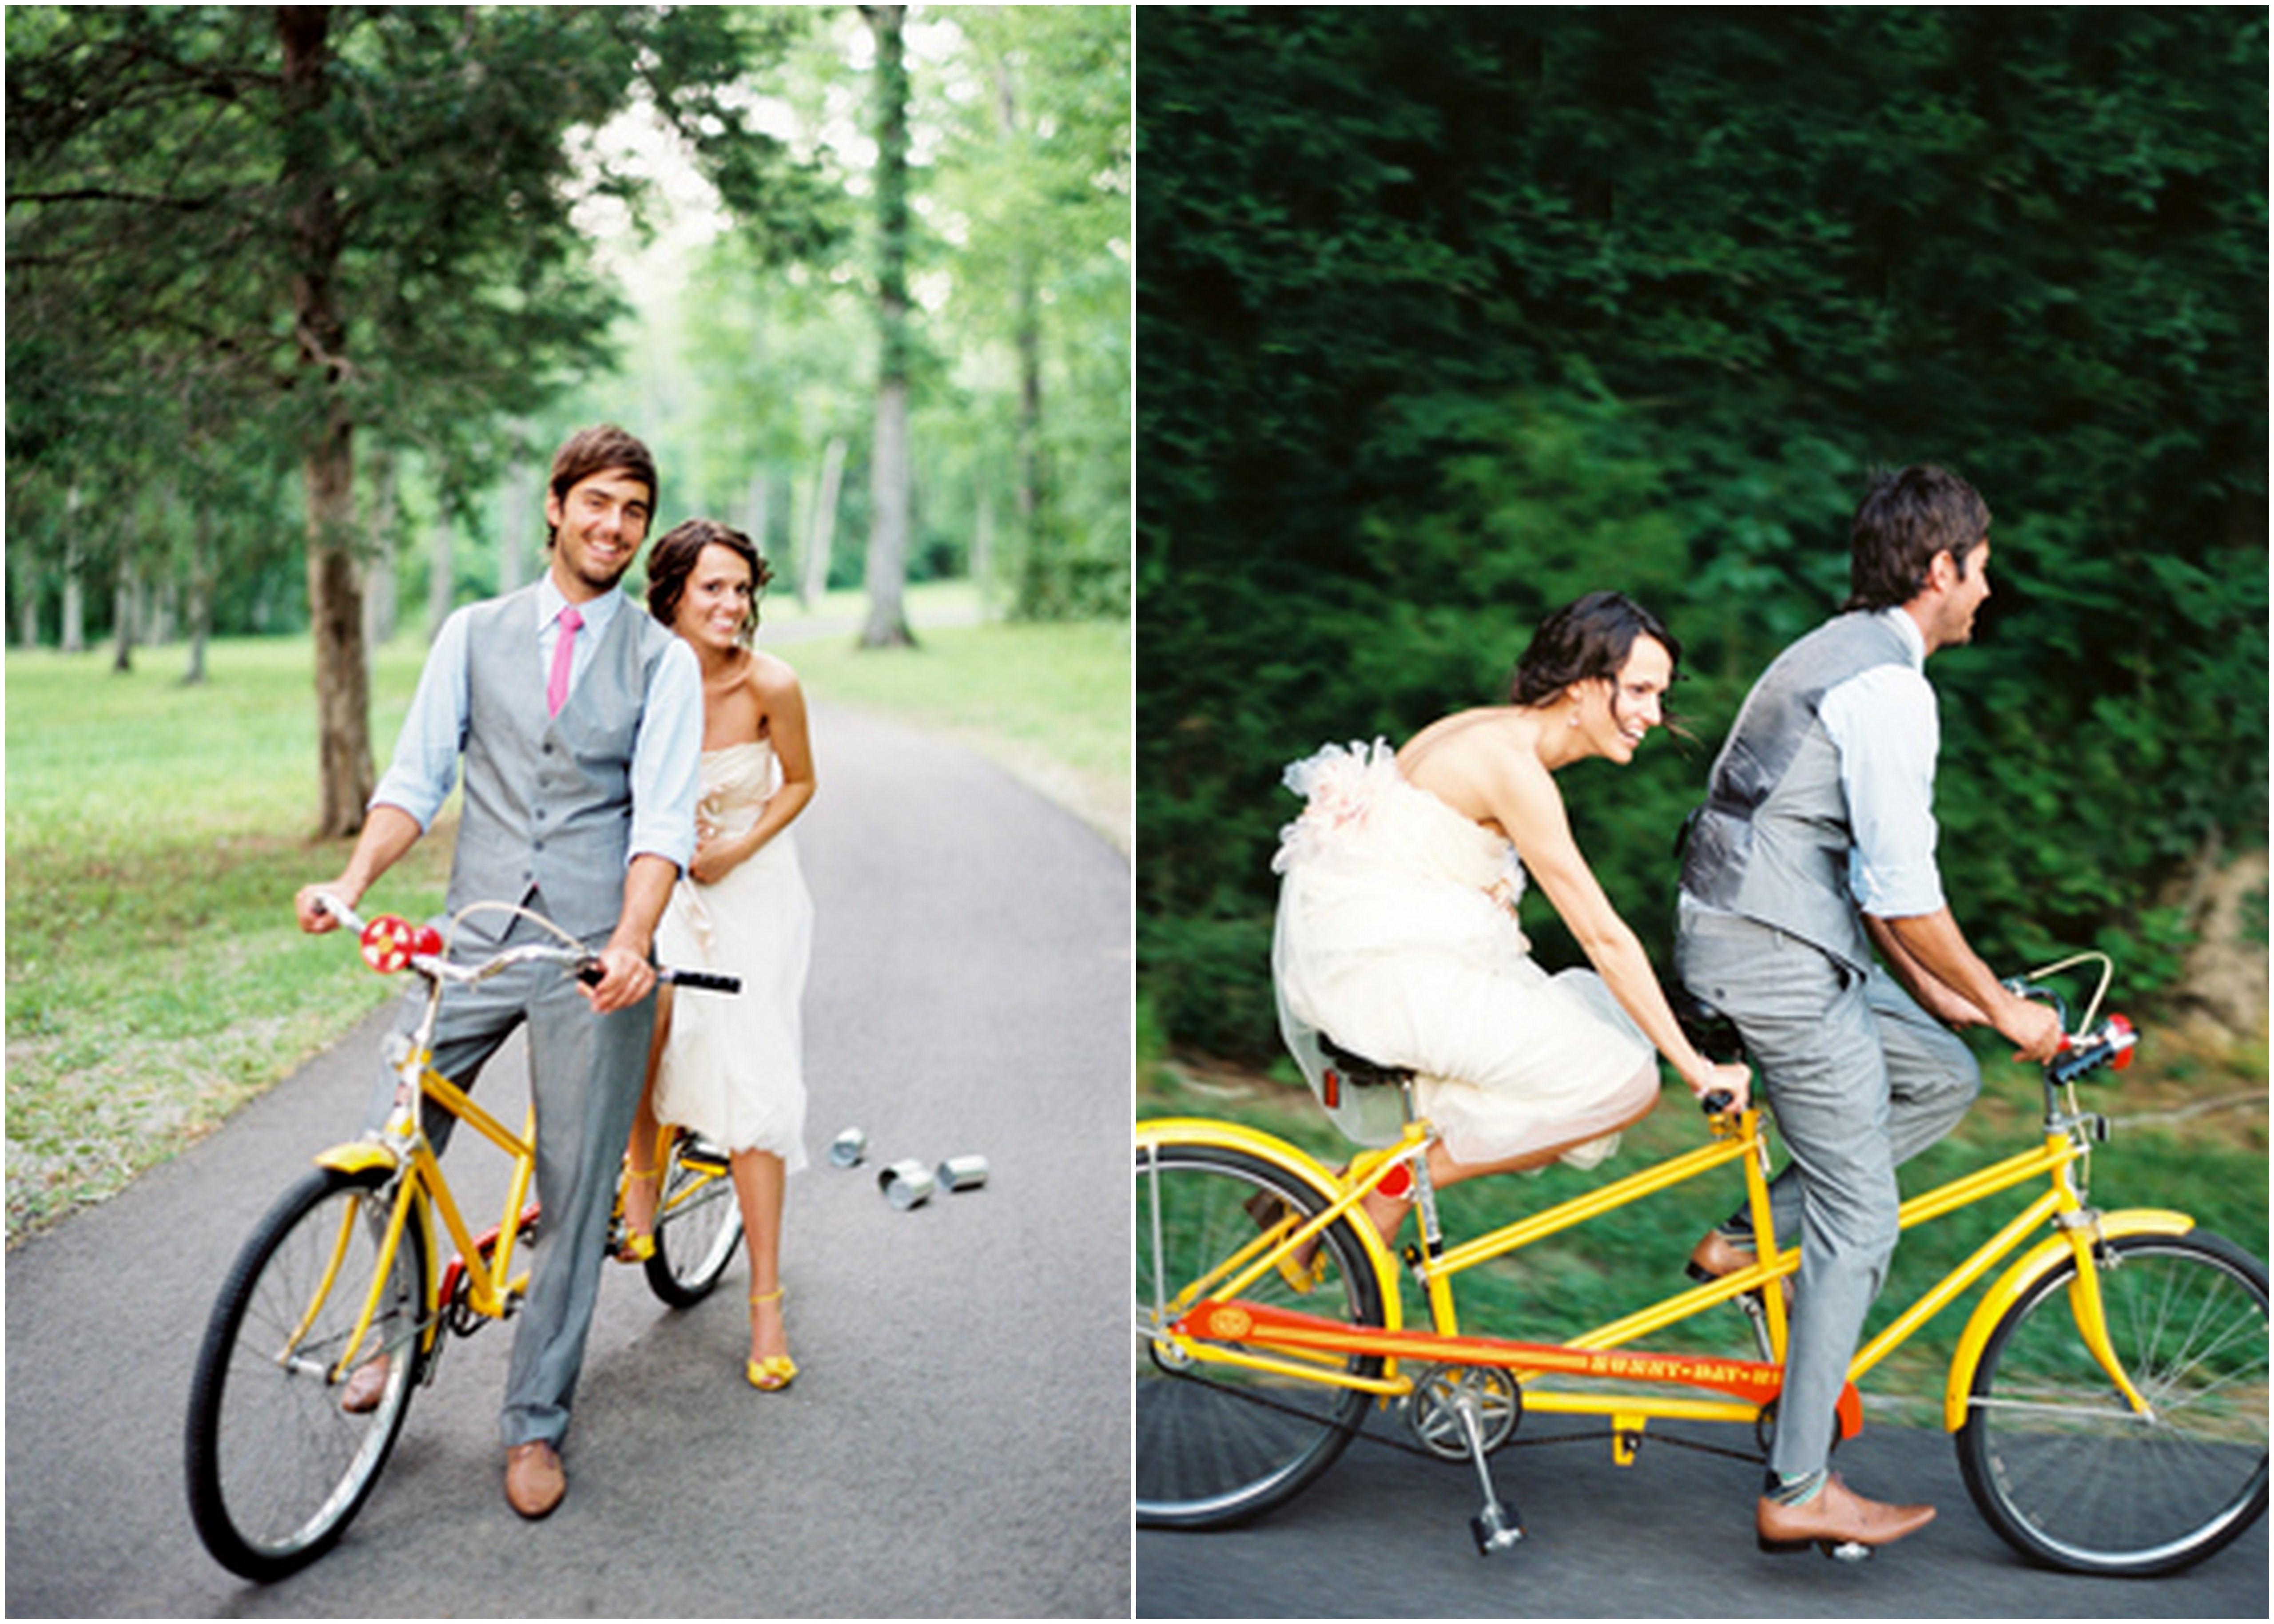 Brides on Bikes